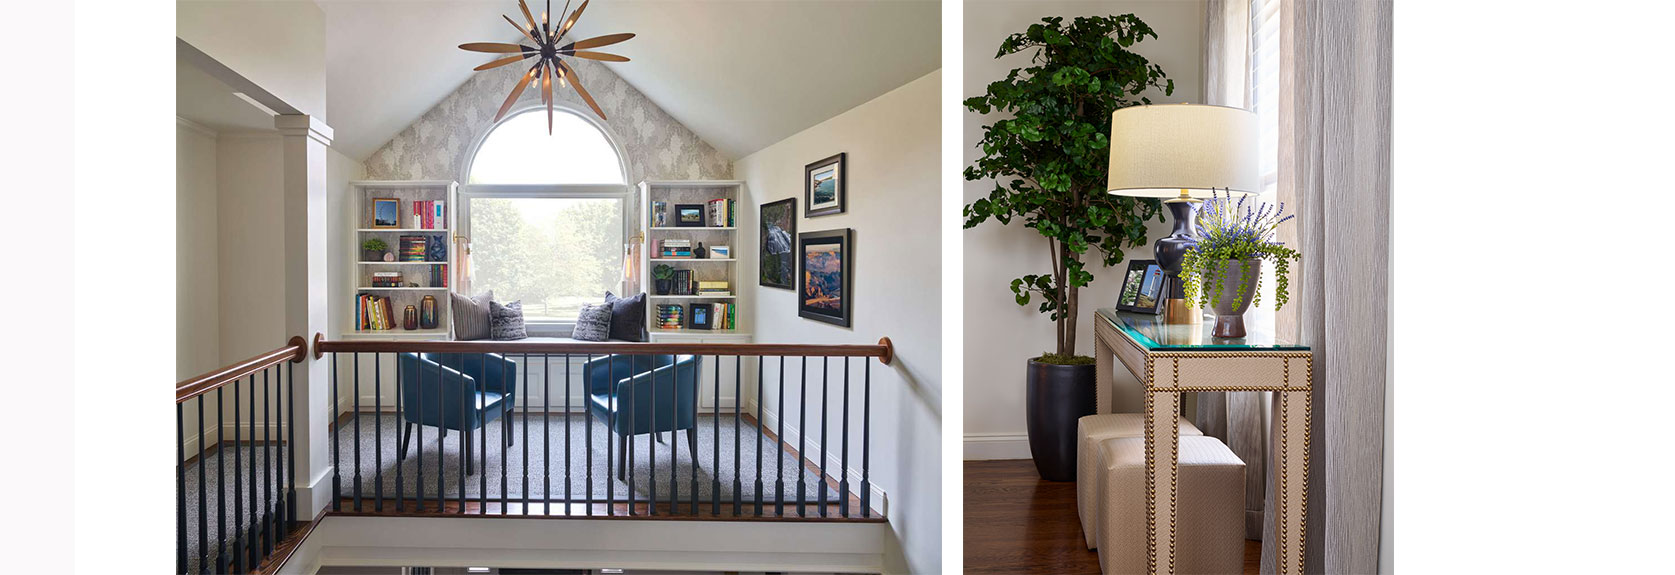 Interior design inspiration by Interiology Design Co.